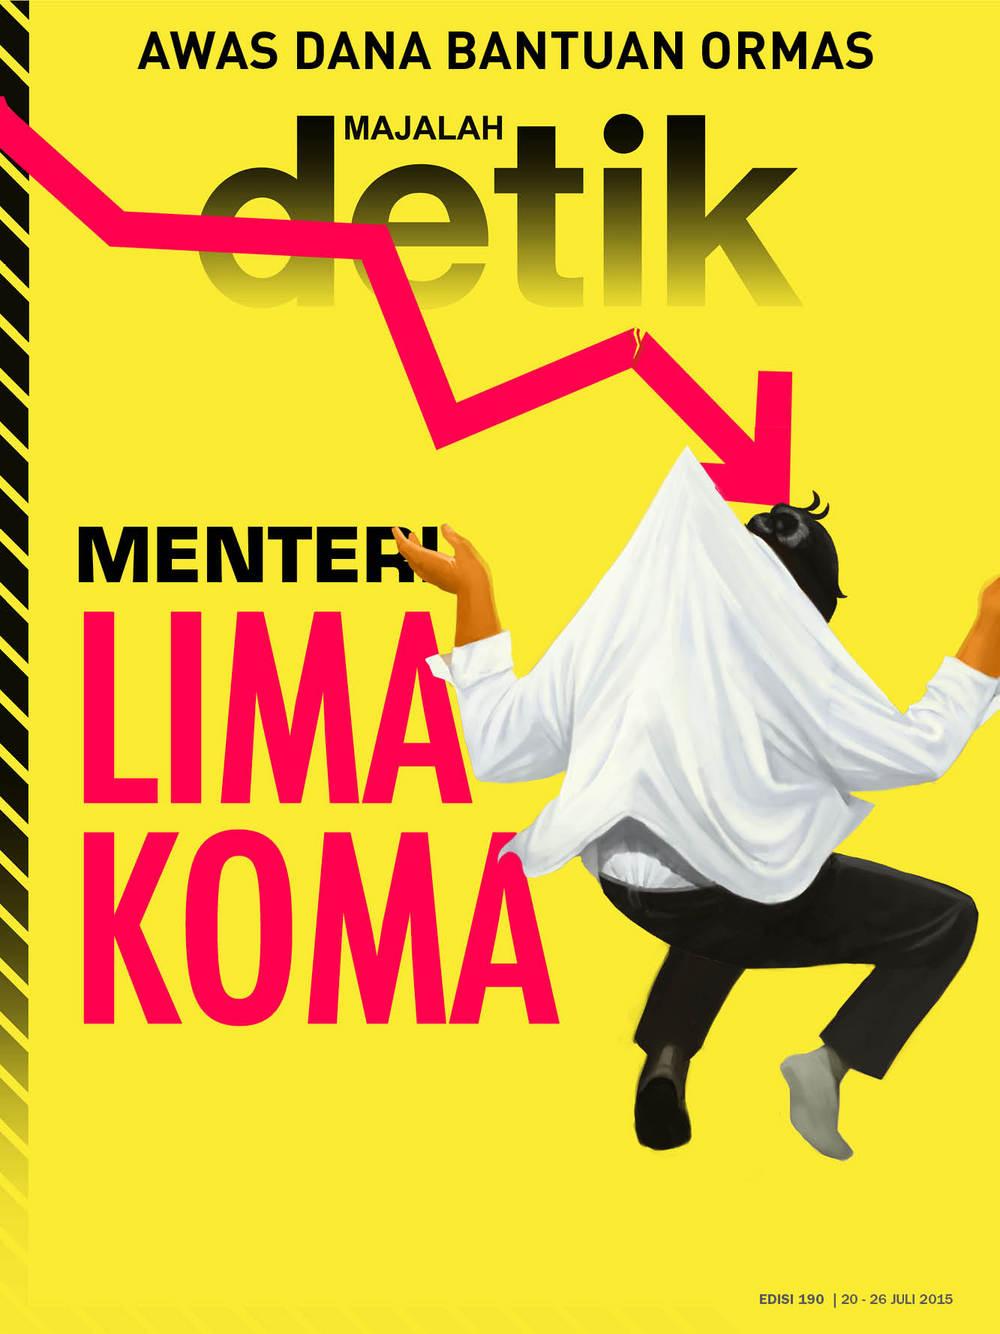 Menteri Lima Koma